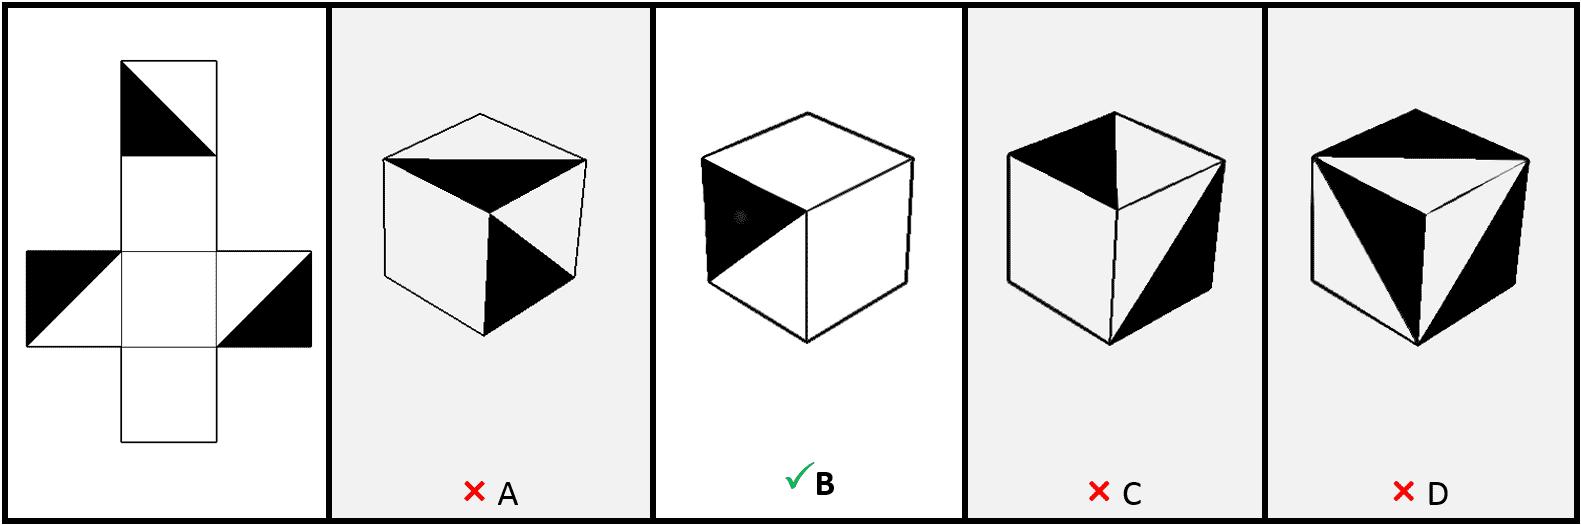 Pattern Folding20_post